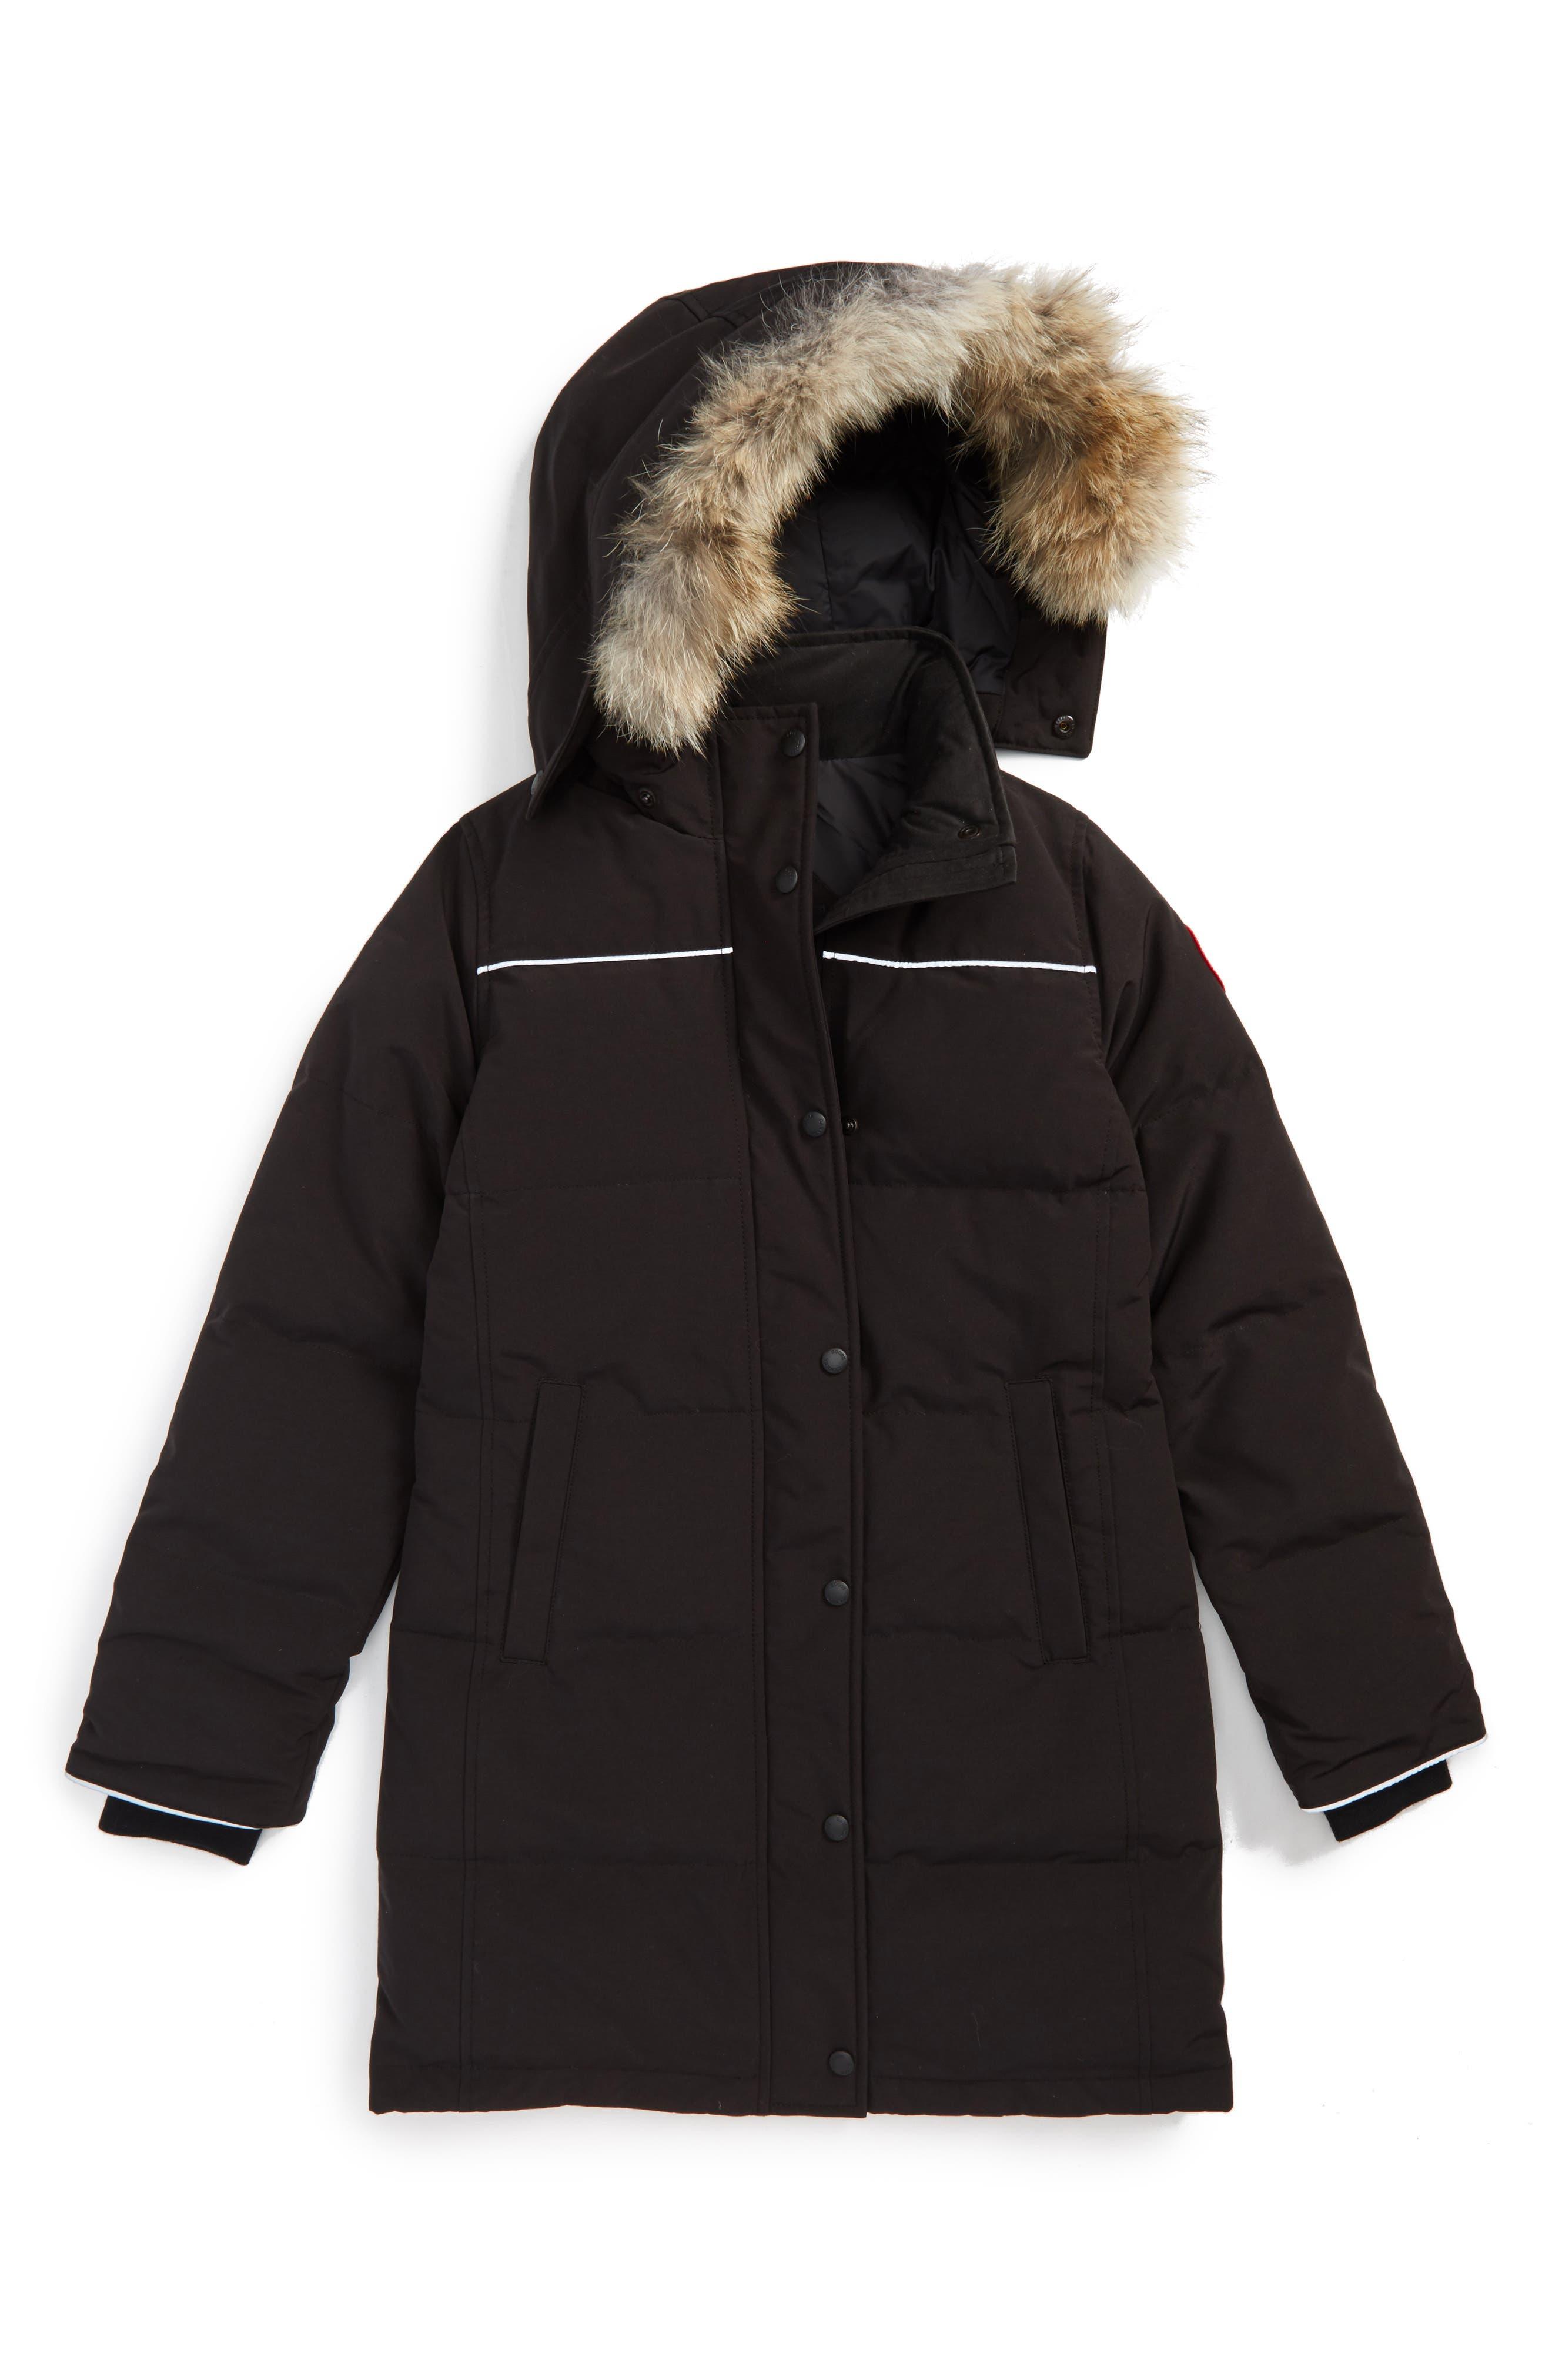 CANADA GOOSE, Juniper Down Parka with Genuine Coyote Fur Trim, Main thumbnail 1, color, BLACK